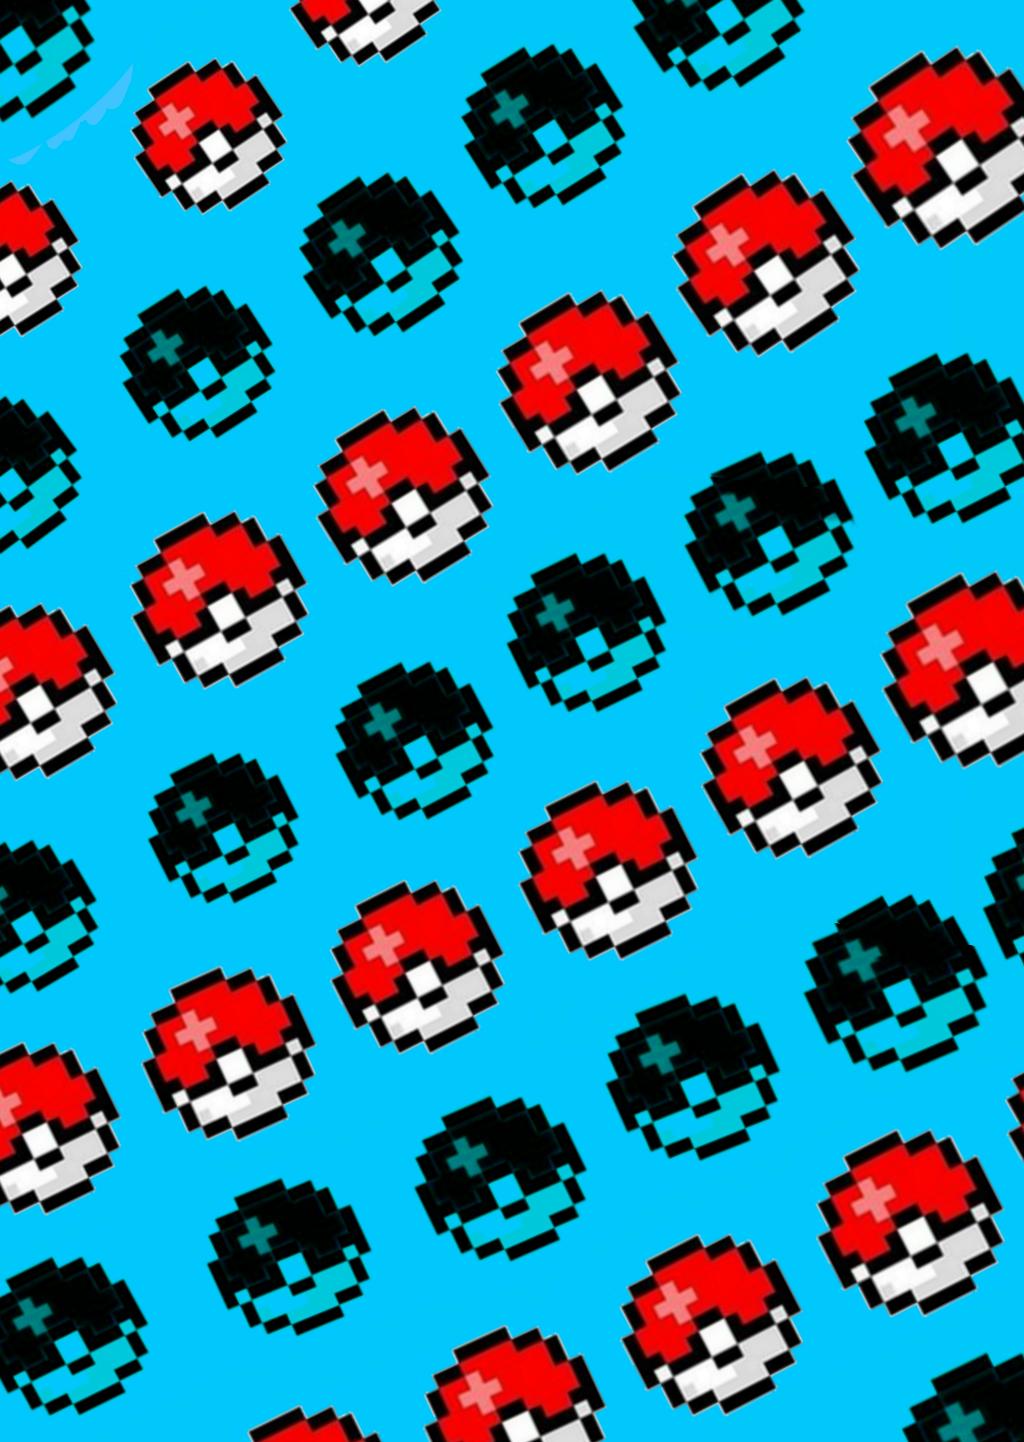 Pokémon Background Pixel Art Made By Me F